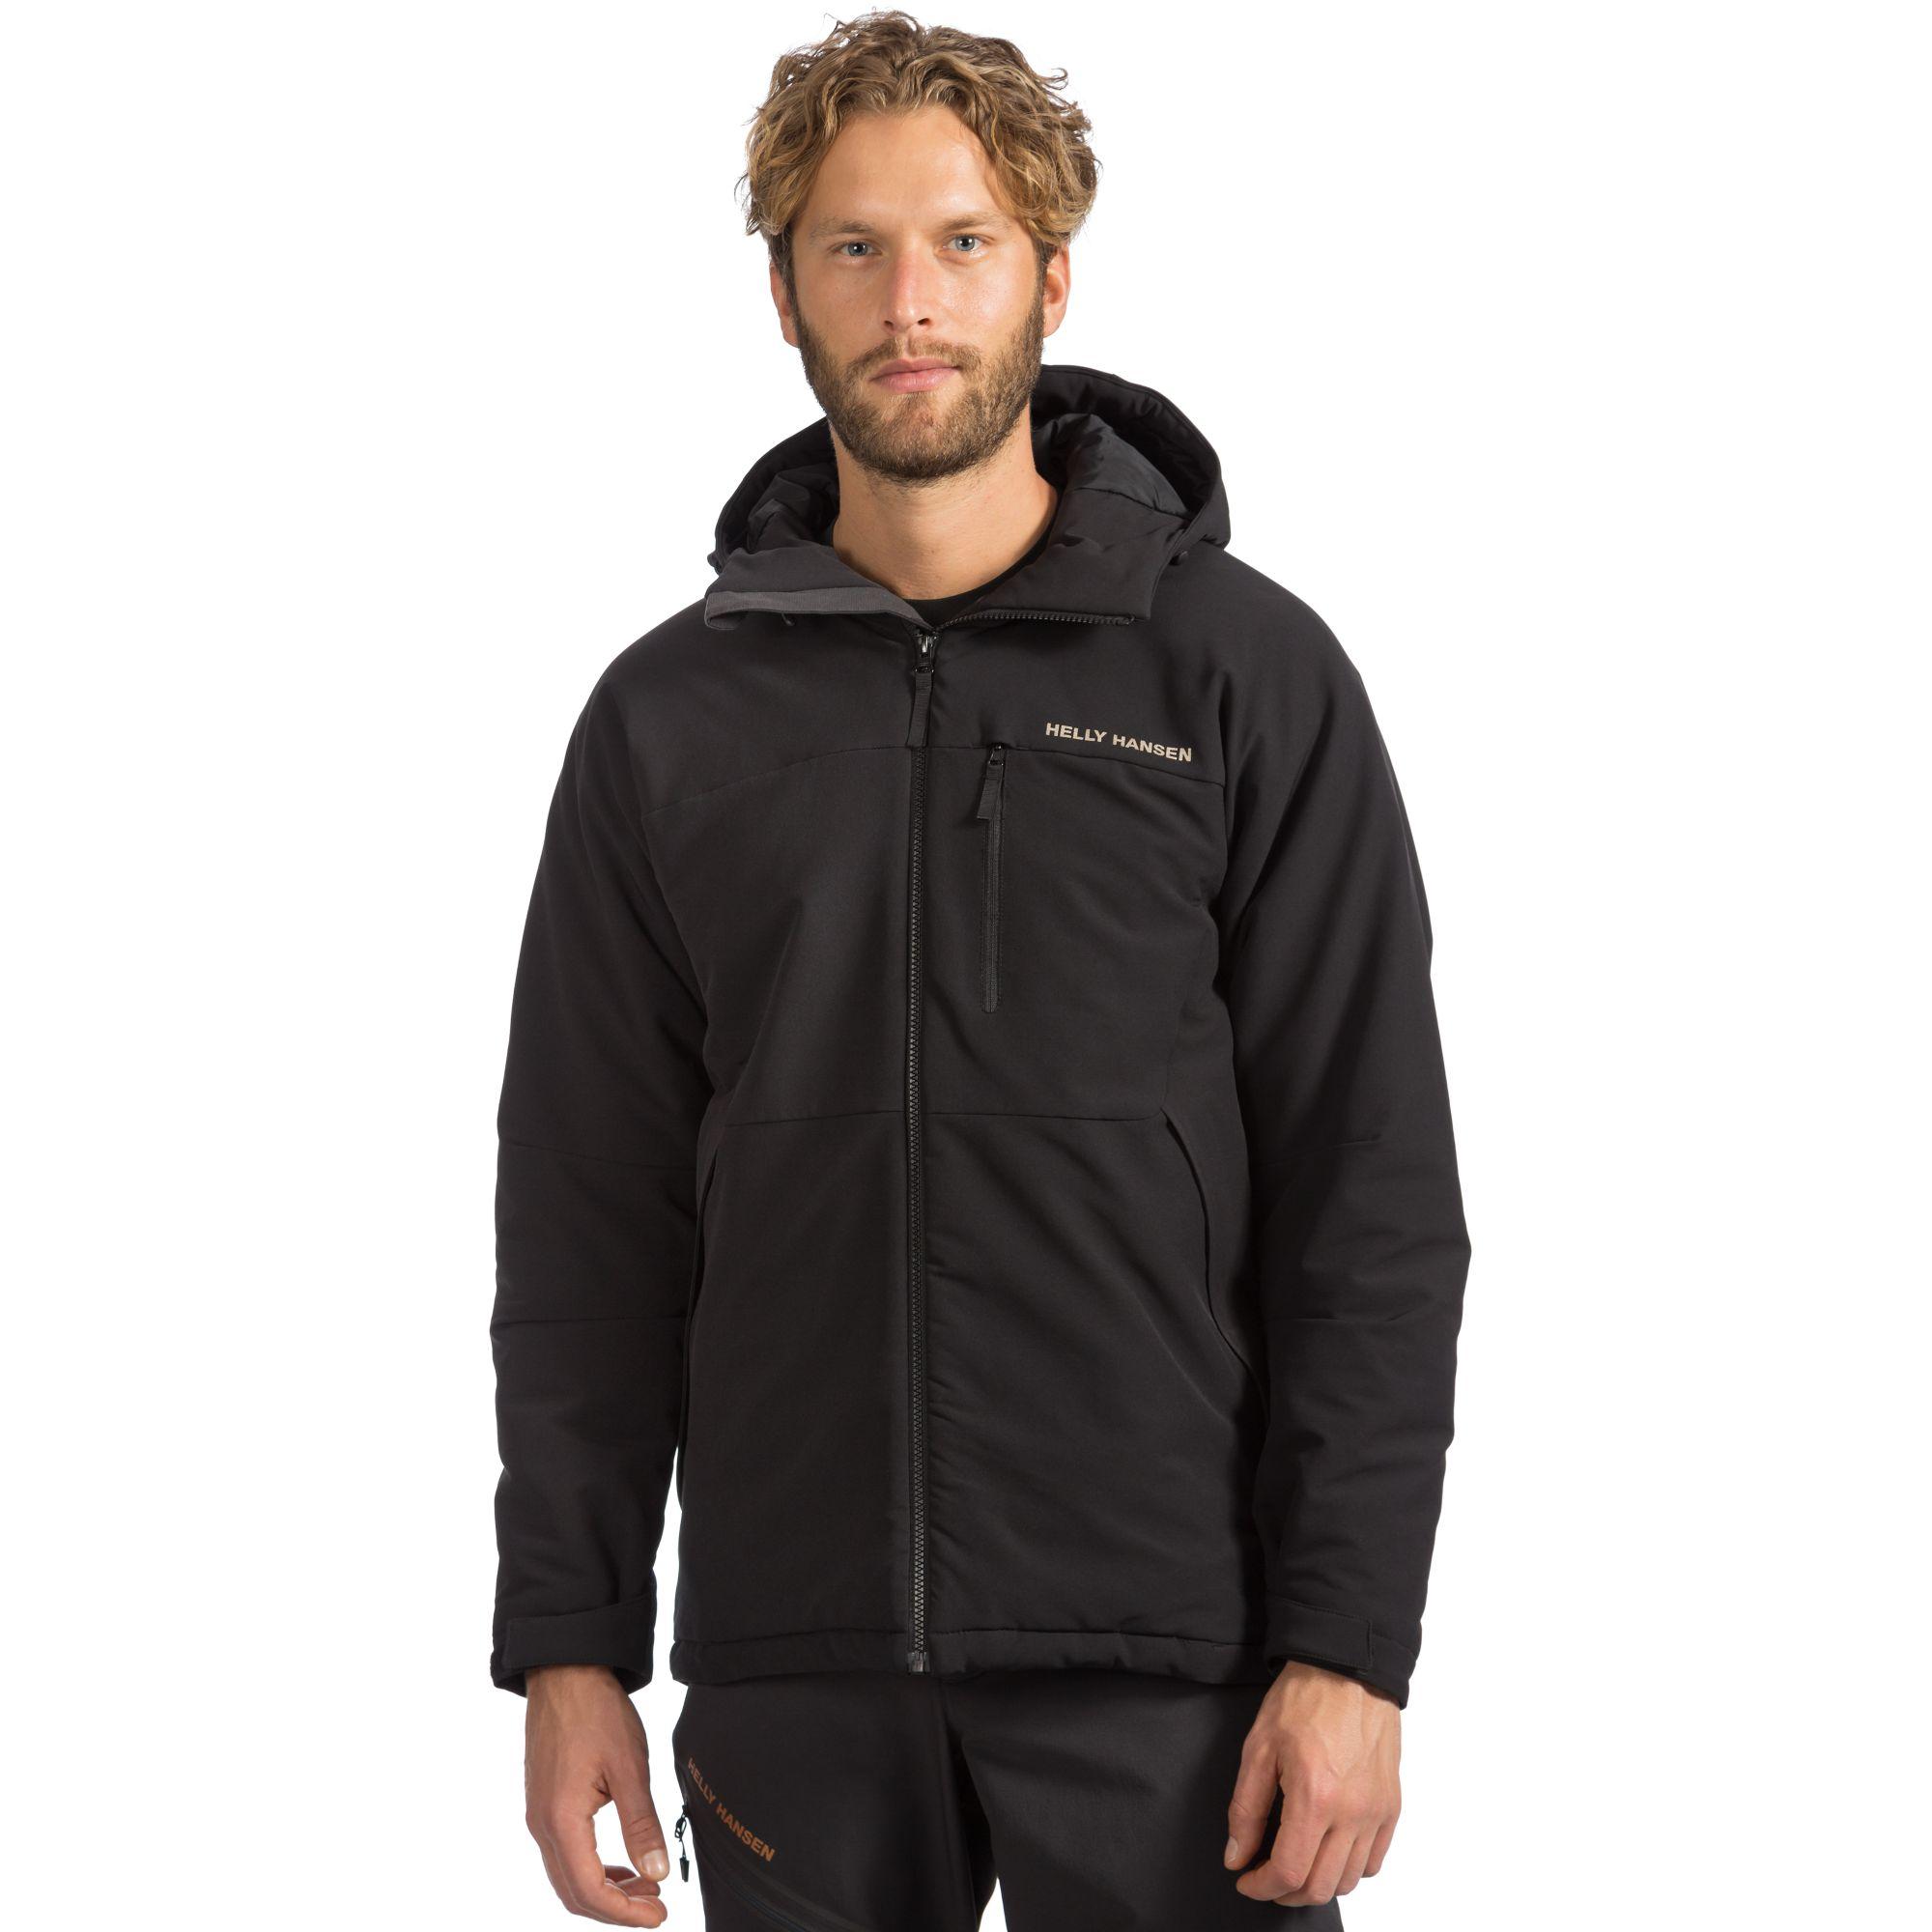 helly hansen odin insulated softshell jacket in black for men lyst. Black Bedroom Furniture Sets. Home Design Ideas